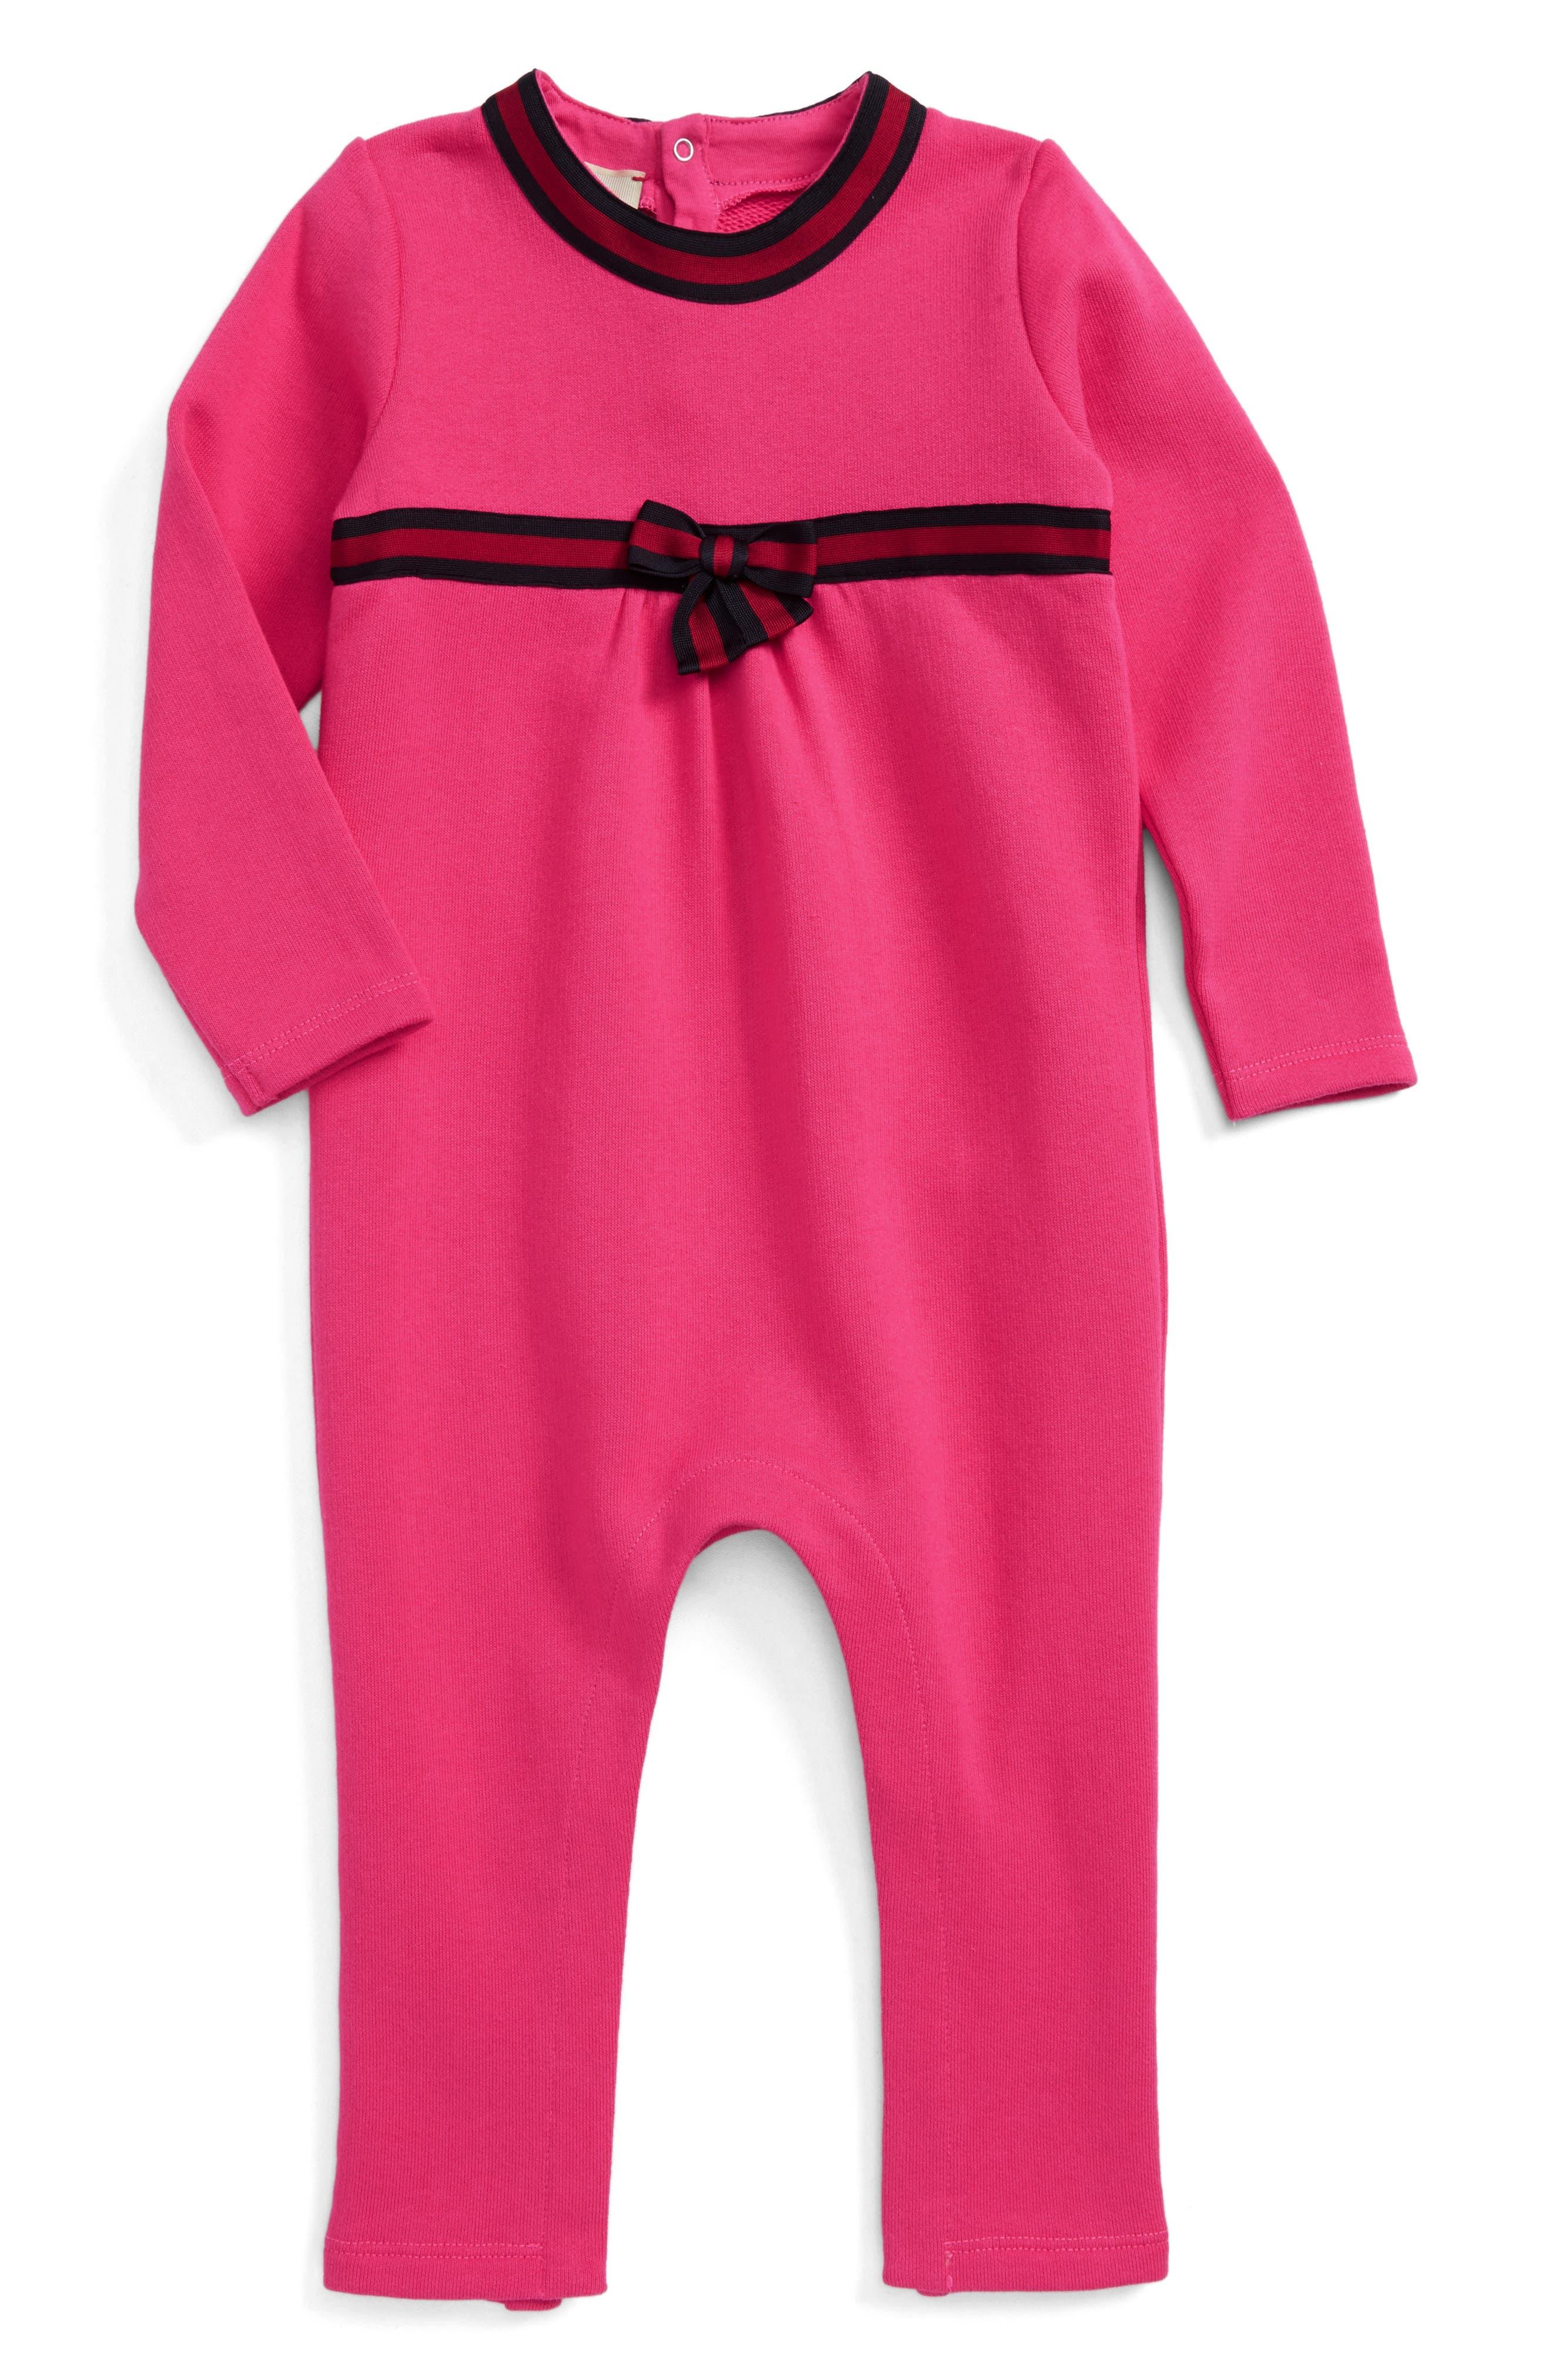 Gucci Knit Romper (Baby Girls)